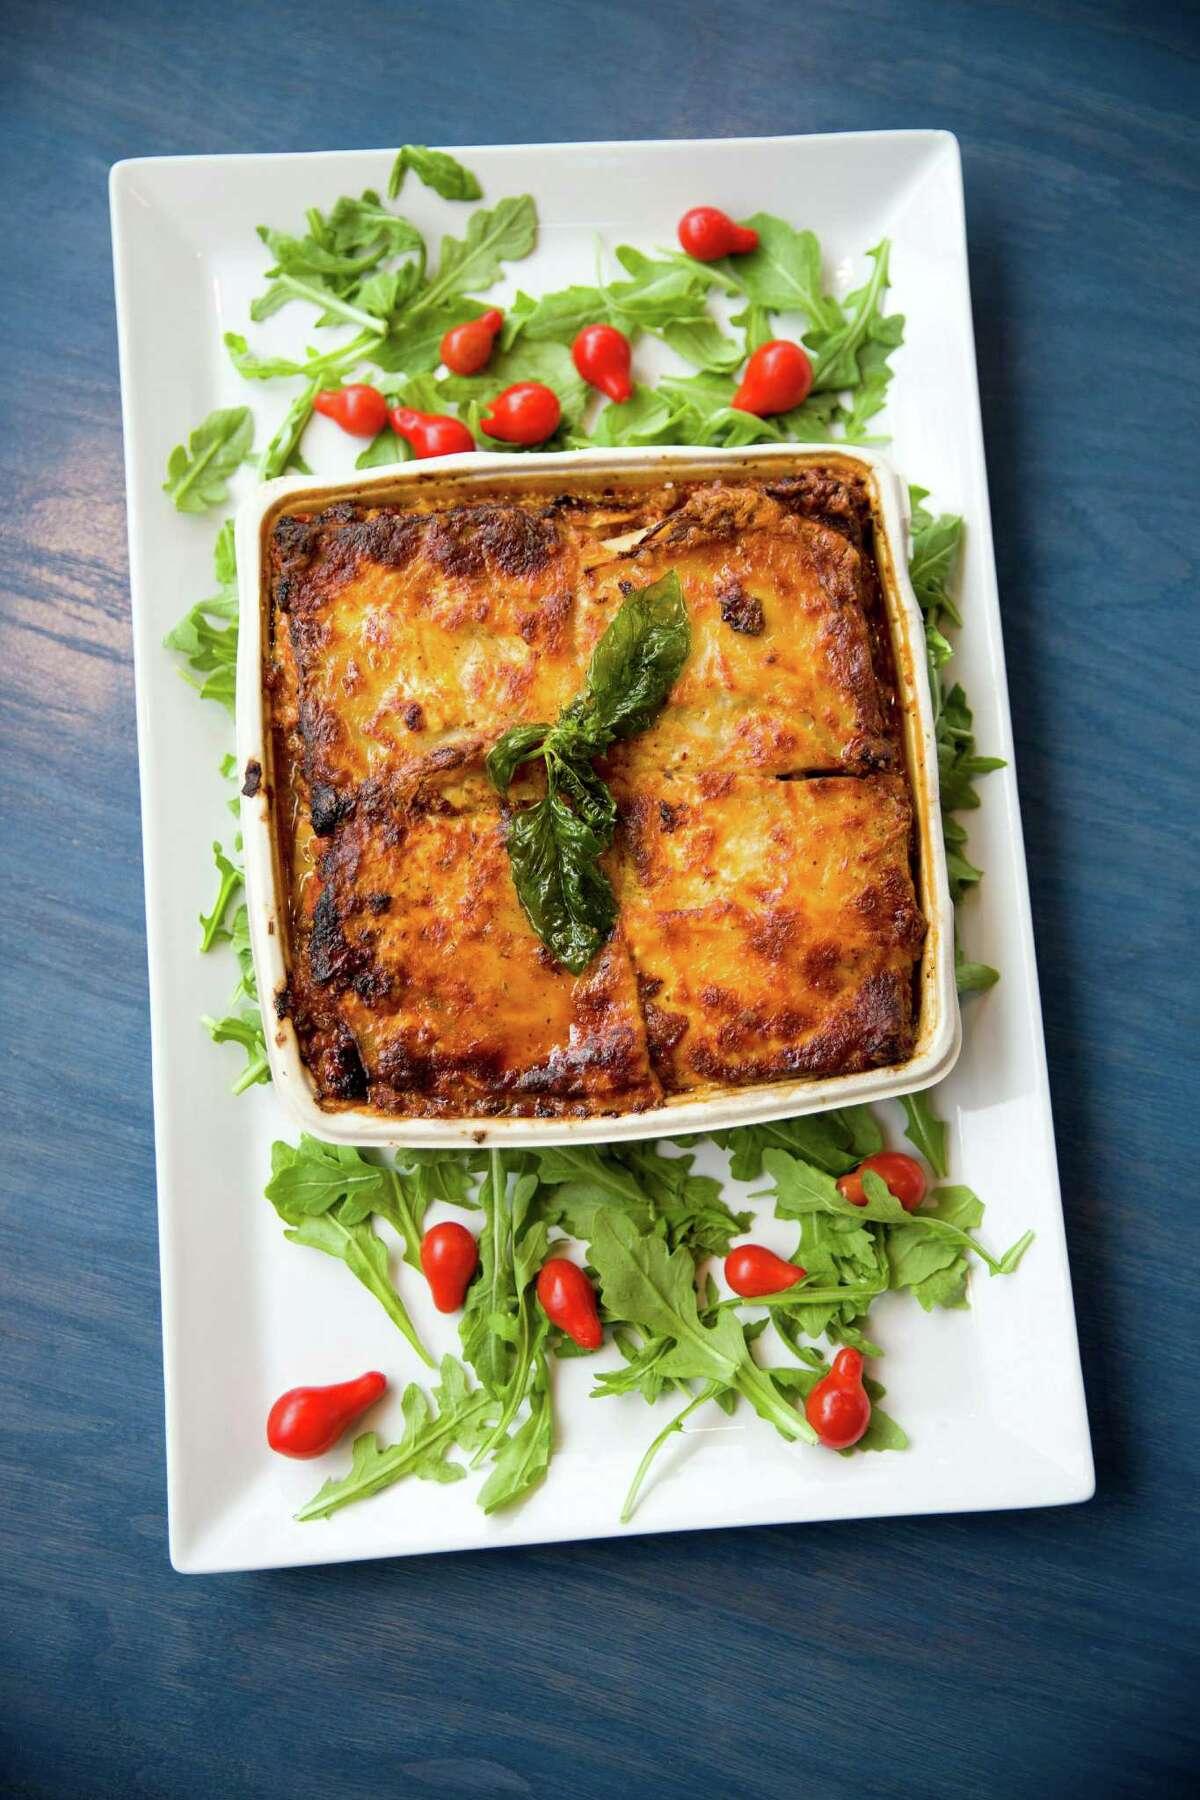 Don't feel like cooking at home? Grab a good lasagna at Cafe Dijon and heat it up at home.